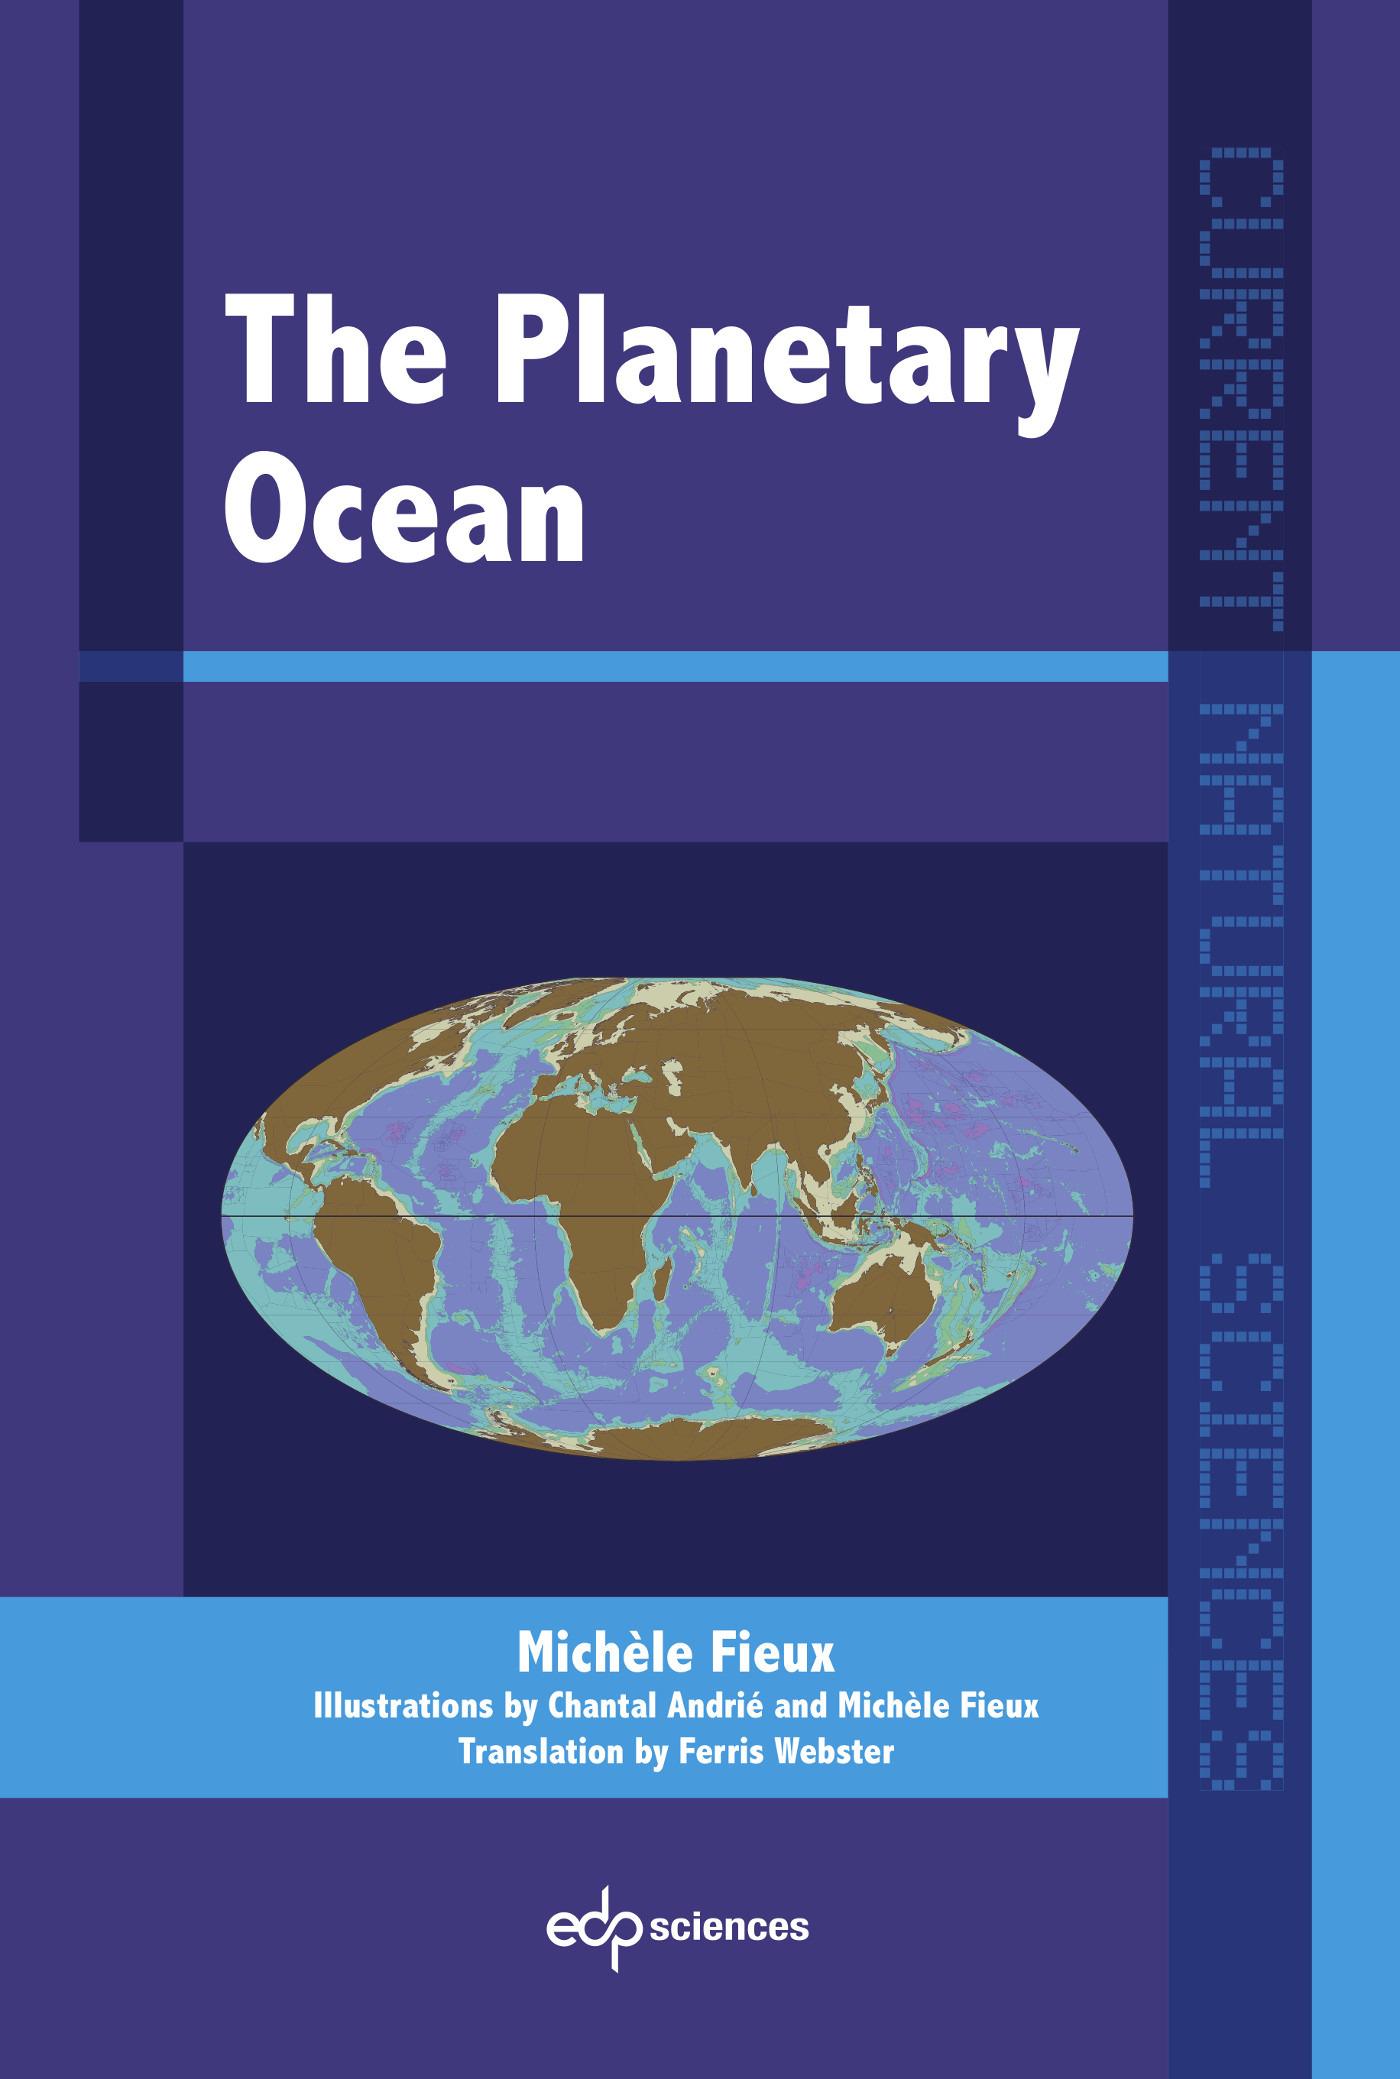 The planetary ocean